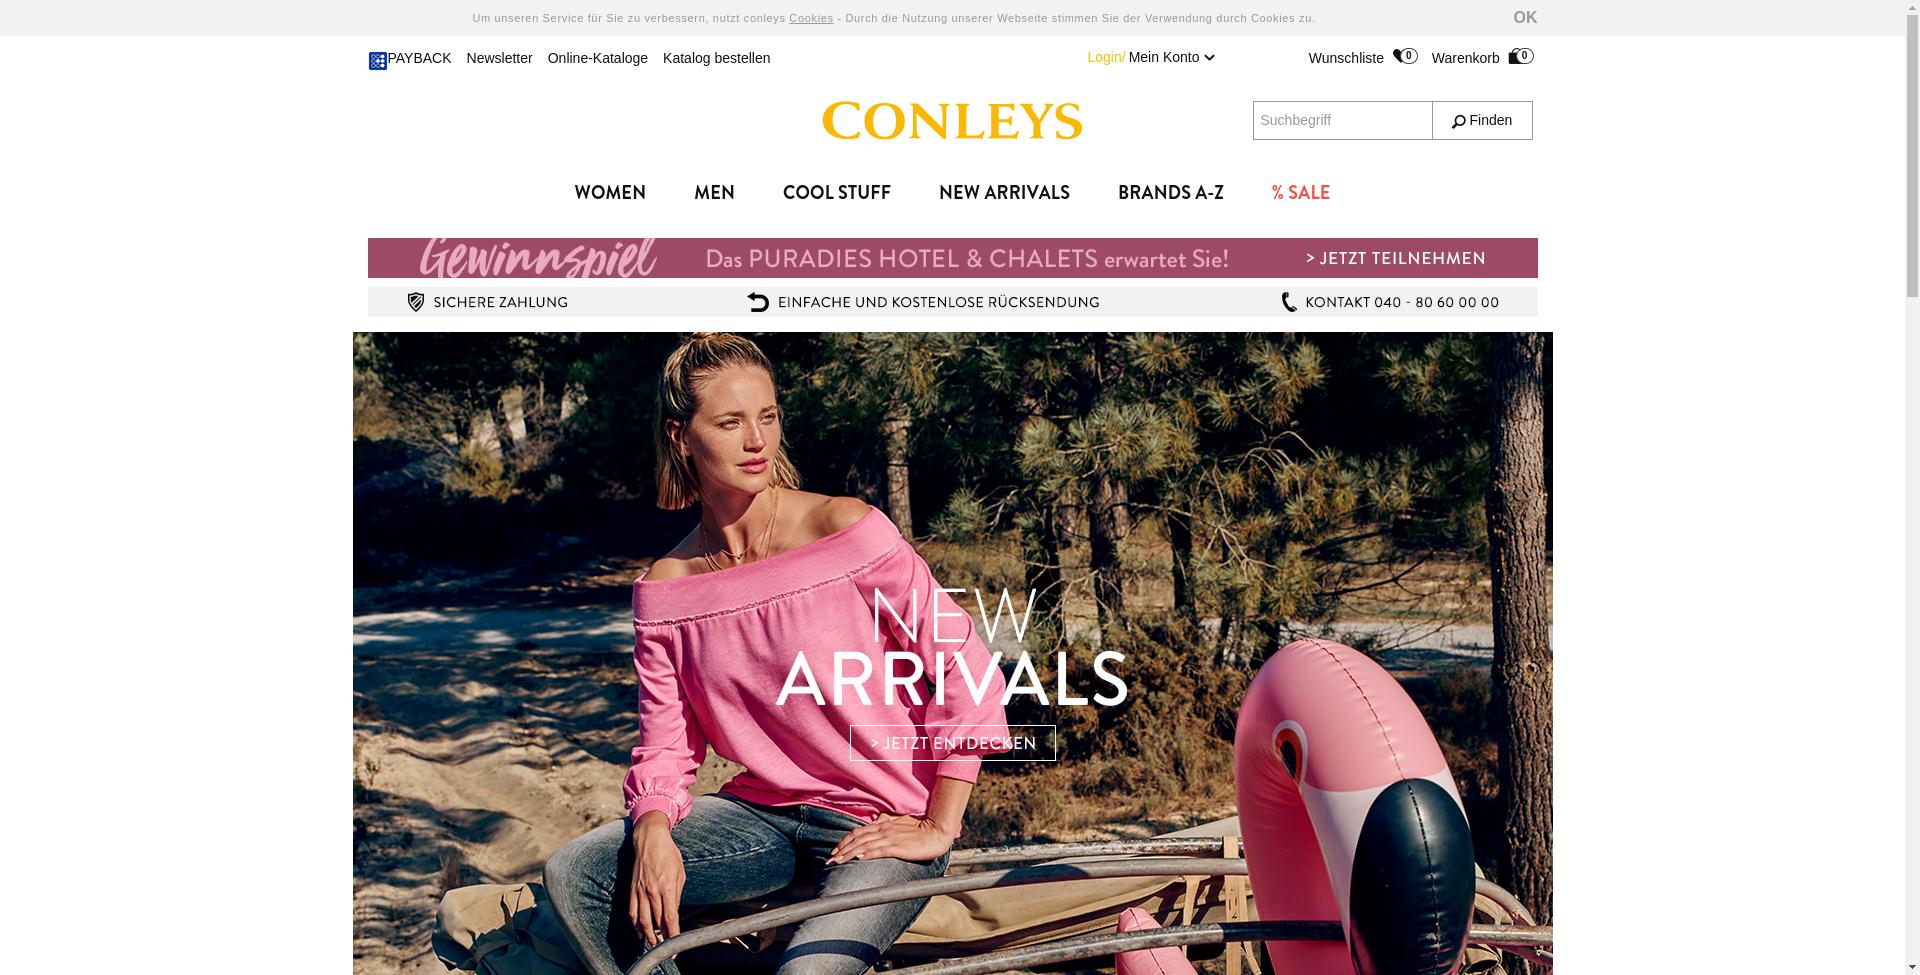 CONLEYS